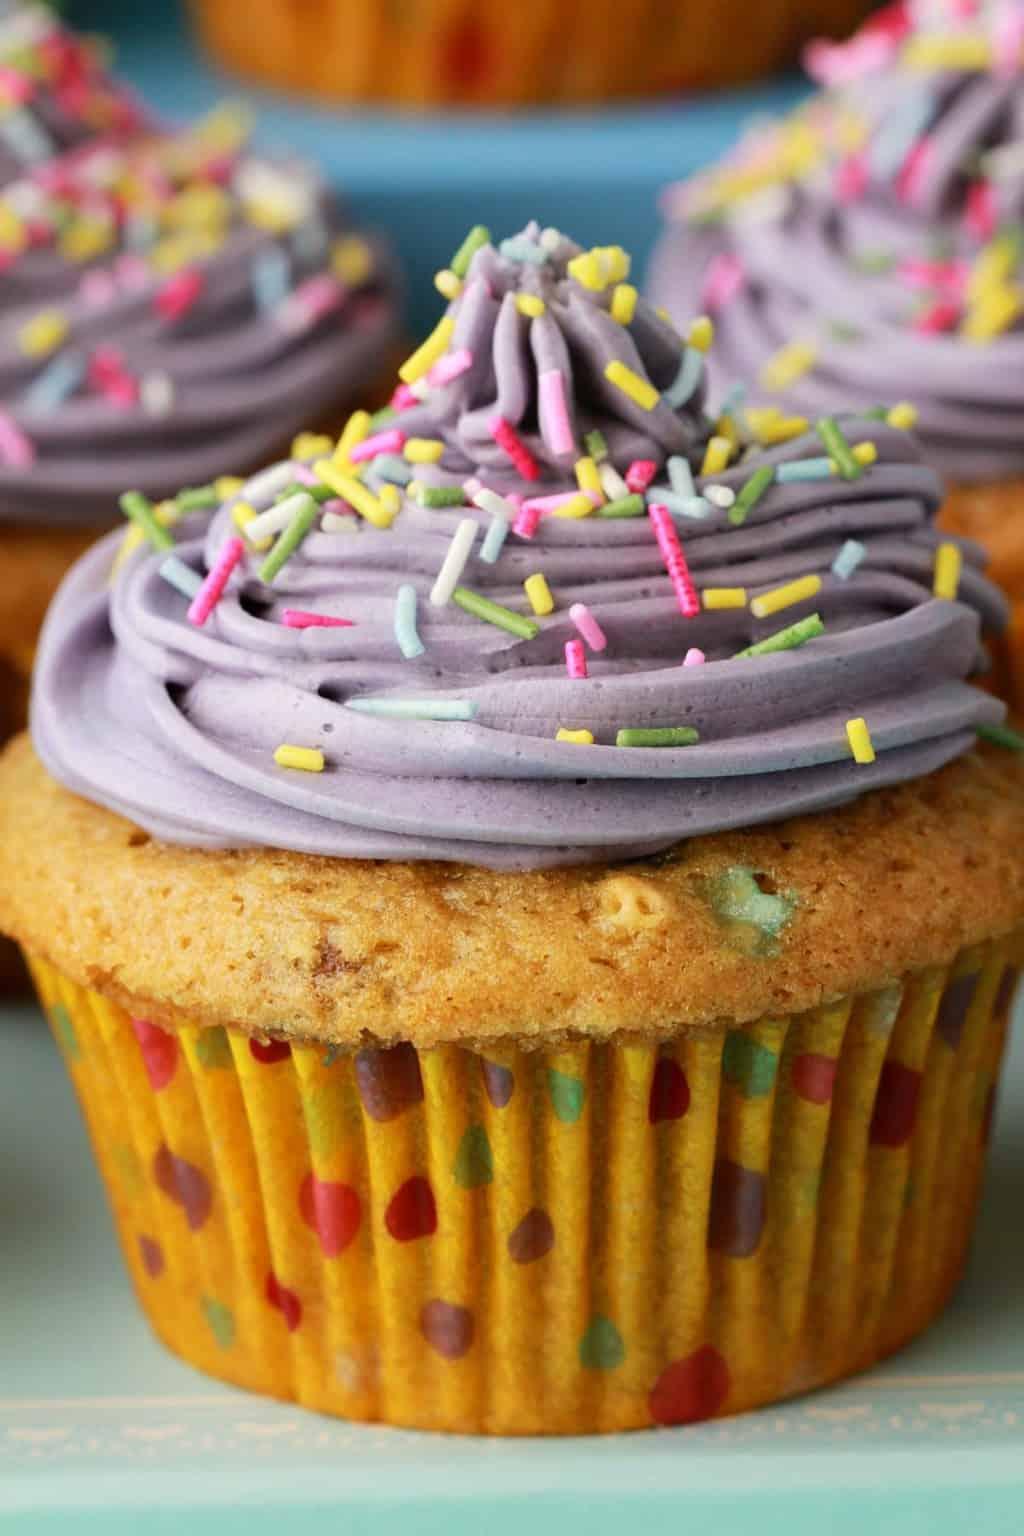 Gorgeously colorful vegan funfetti cupcakes. Moist, light and fluffy vegan cupcakes with purple frosting and plenty of sprinkles! #vegan #lovingitvegan #cupcakes #dessert